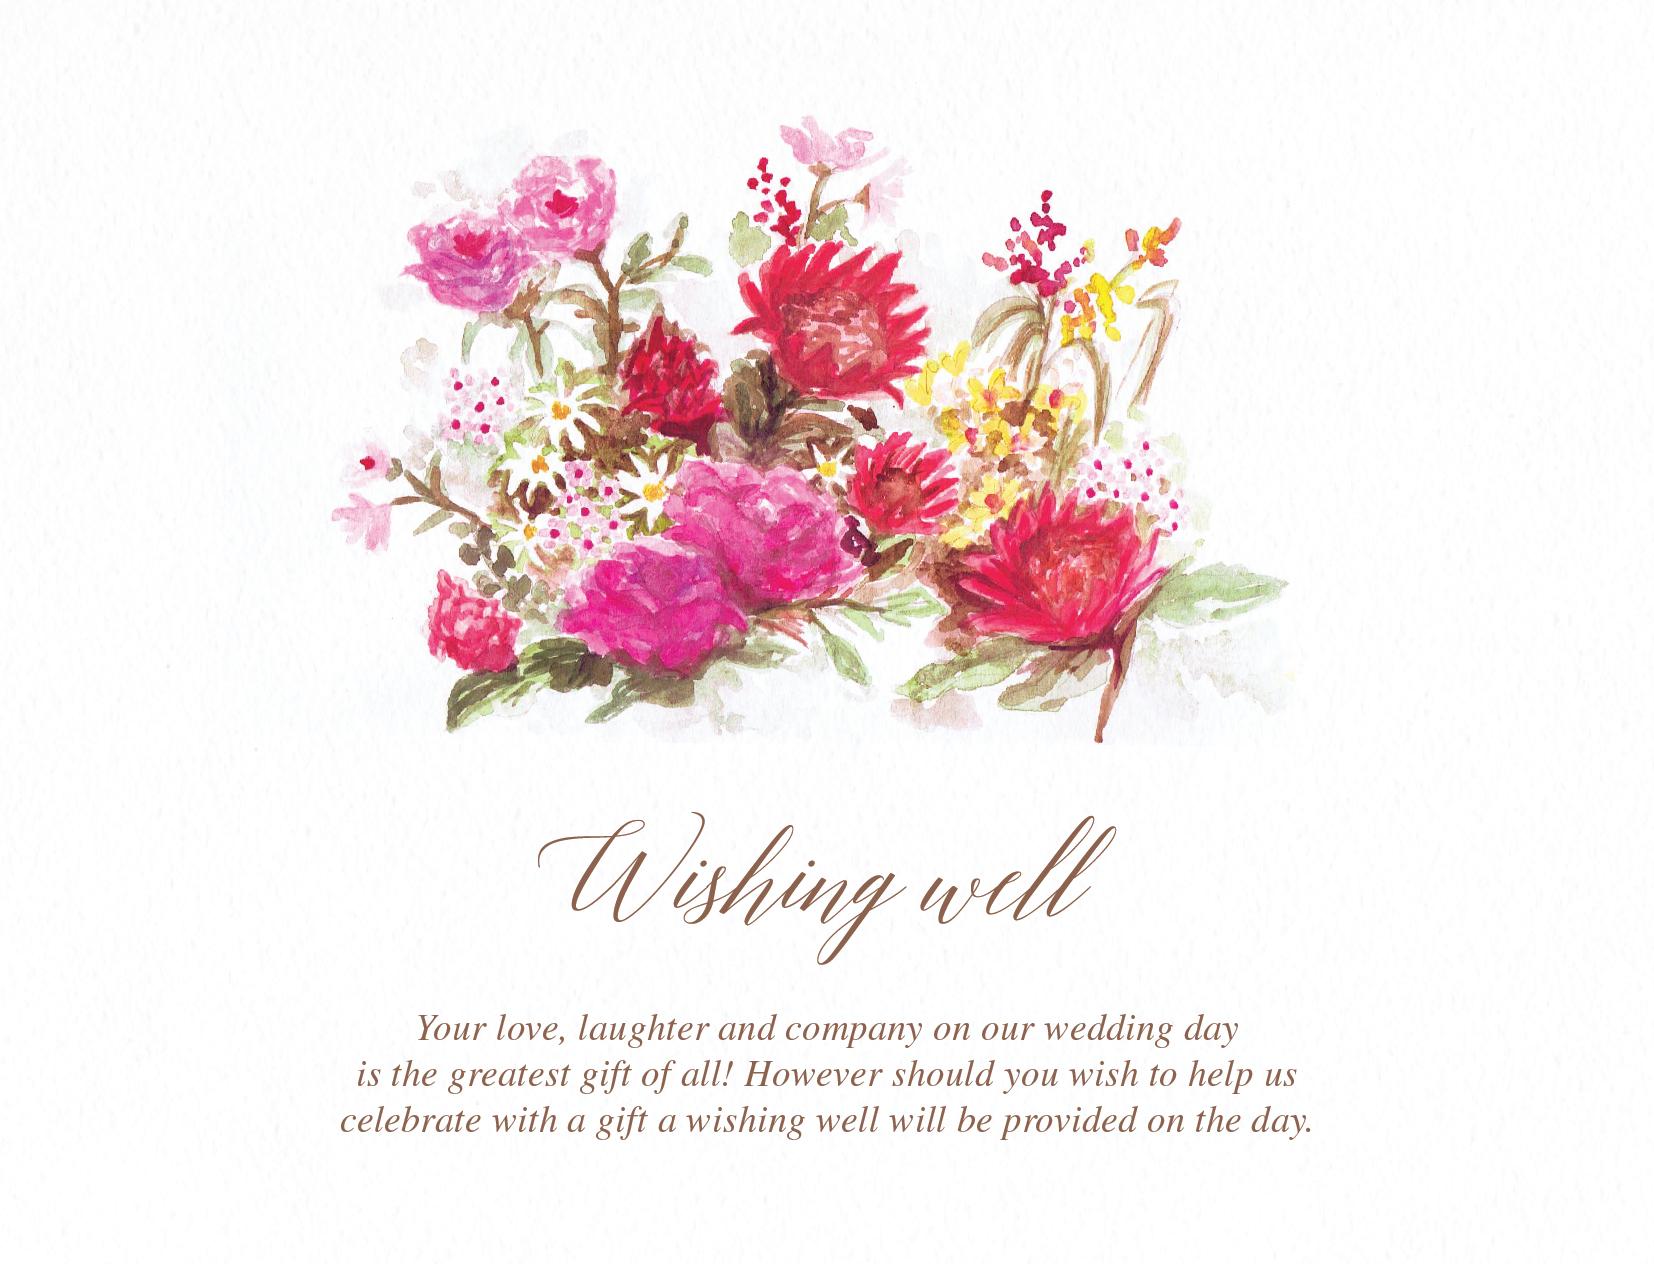 Flowers Hill - Wishing Well